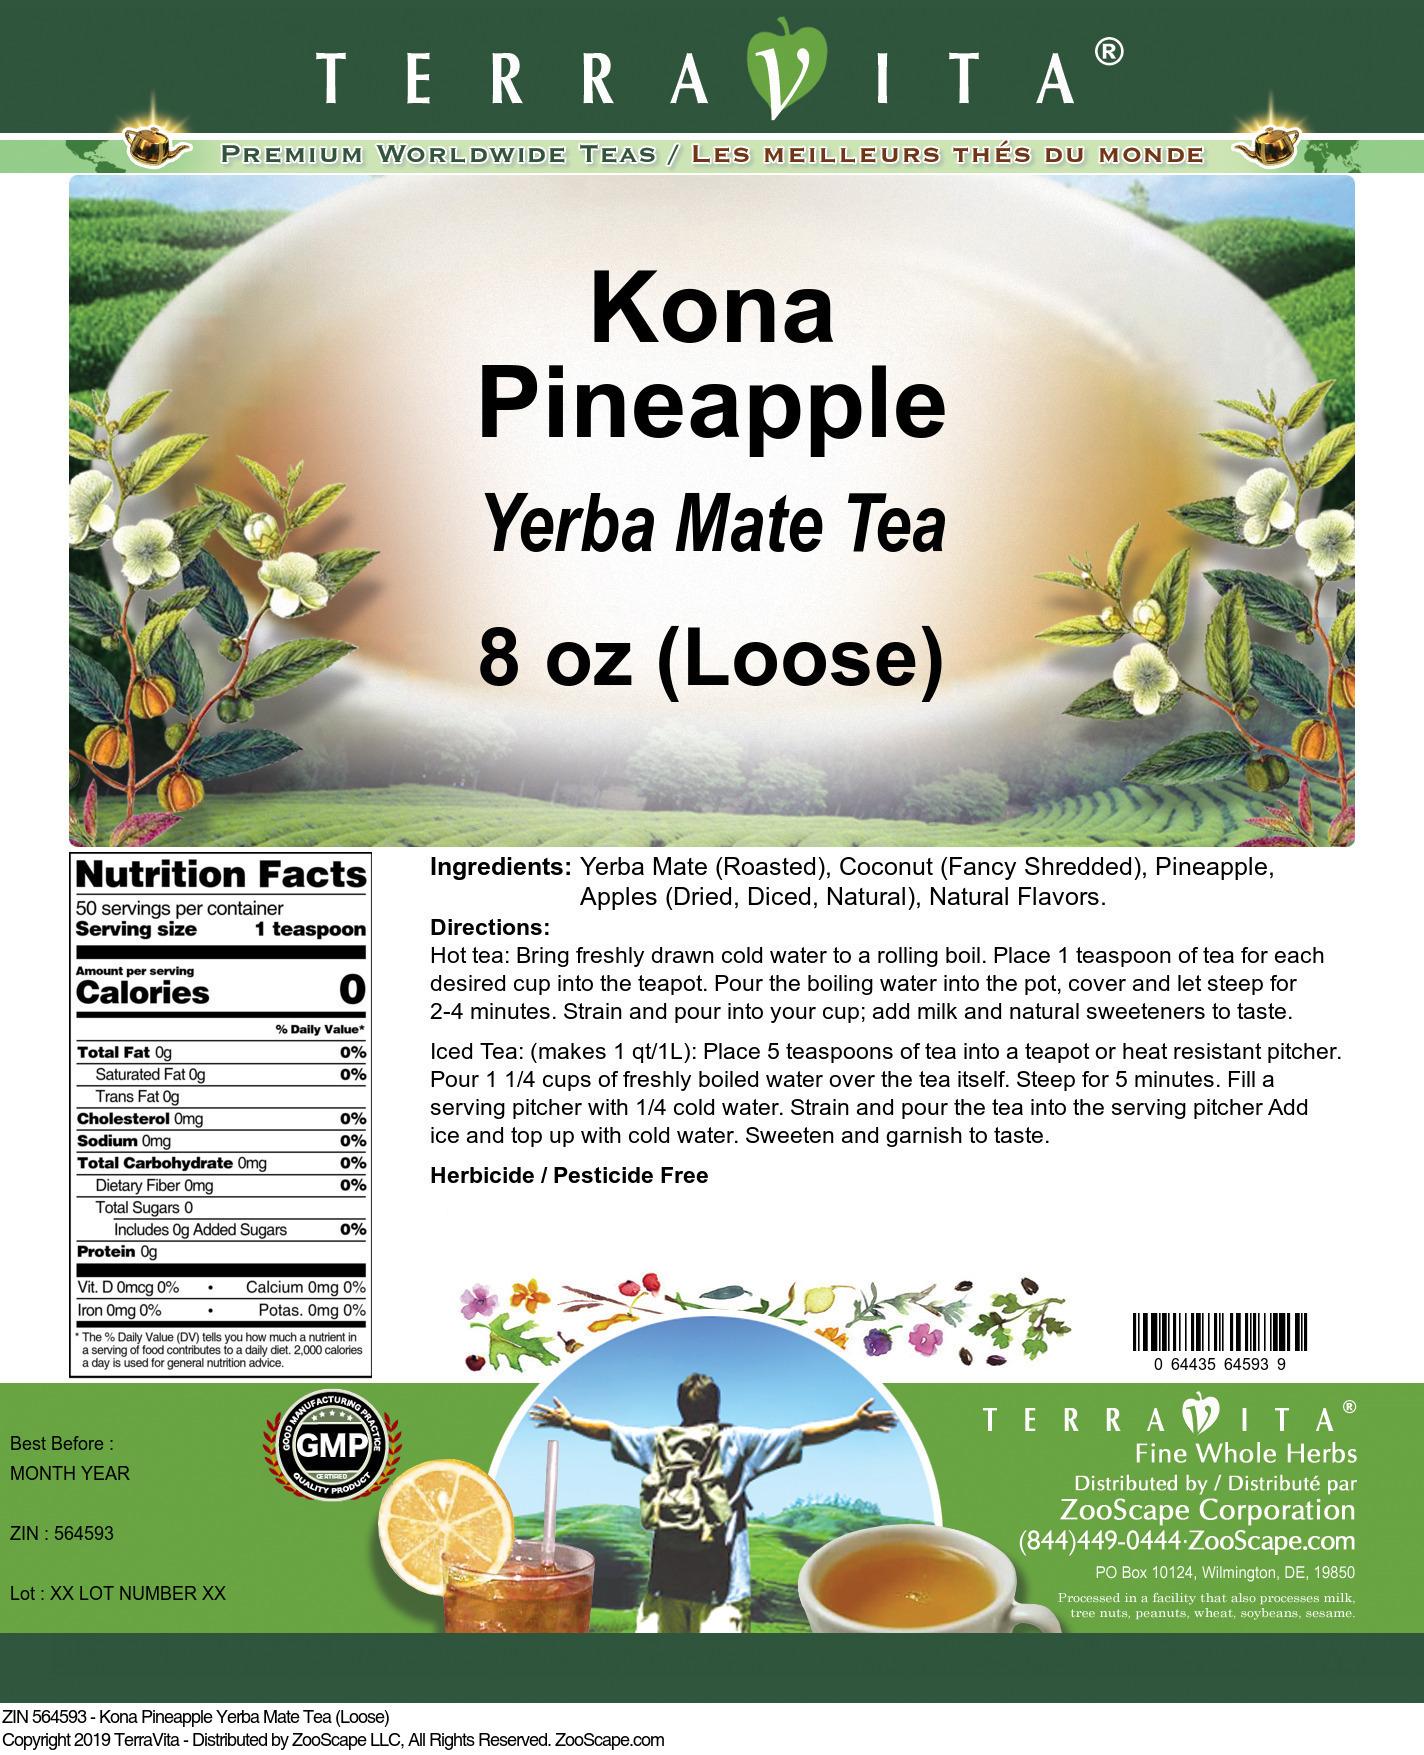 Kona Pineapple Yerba Mate Tea (Loose)